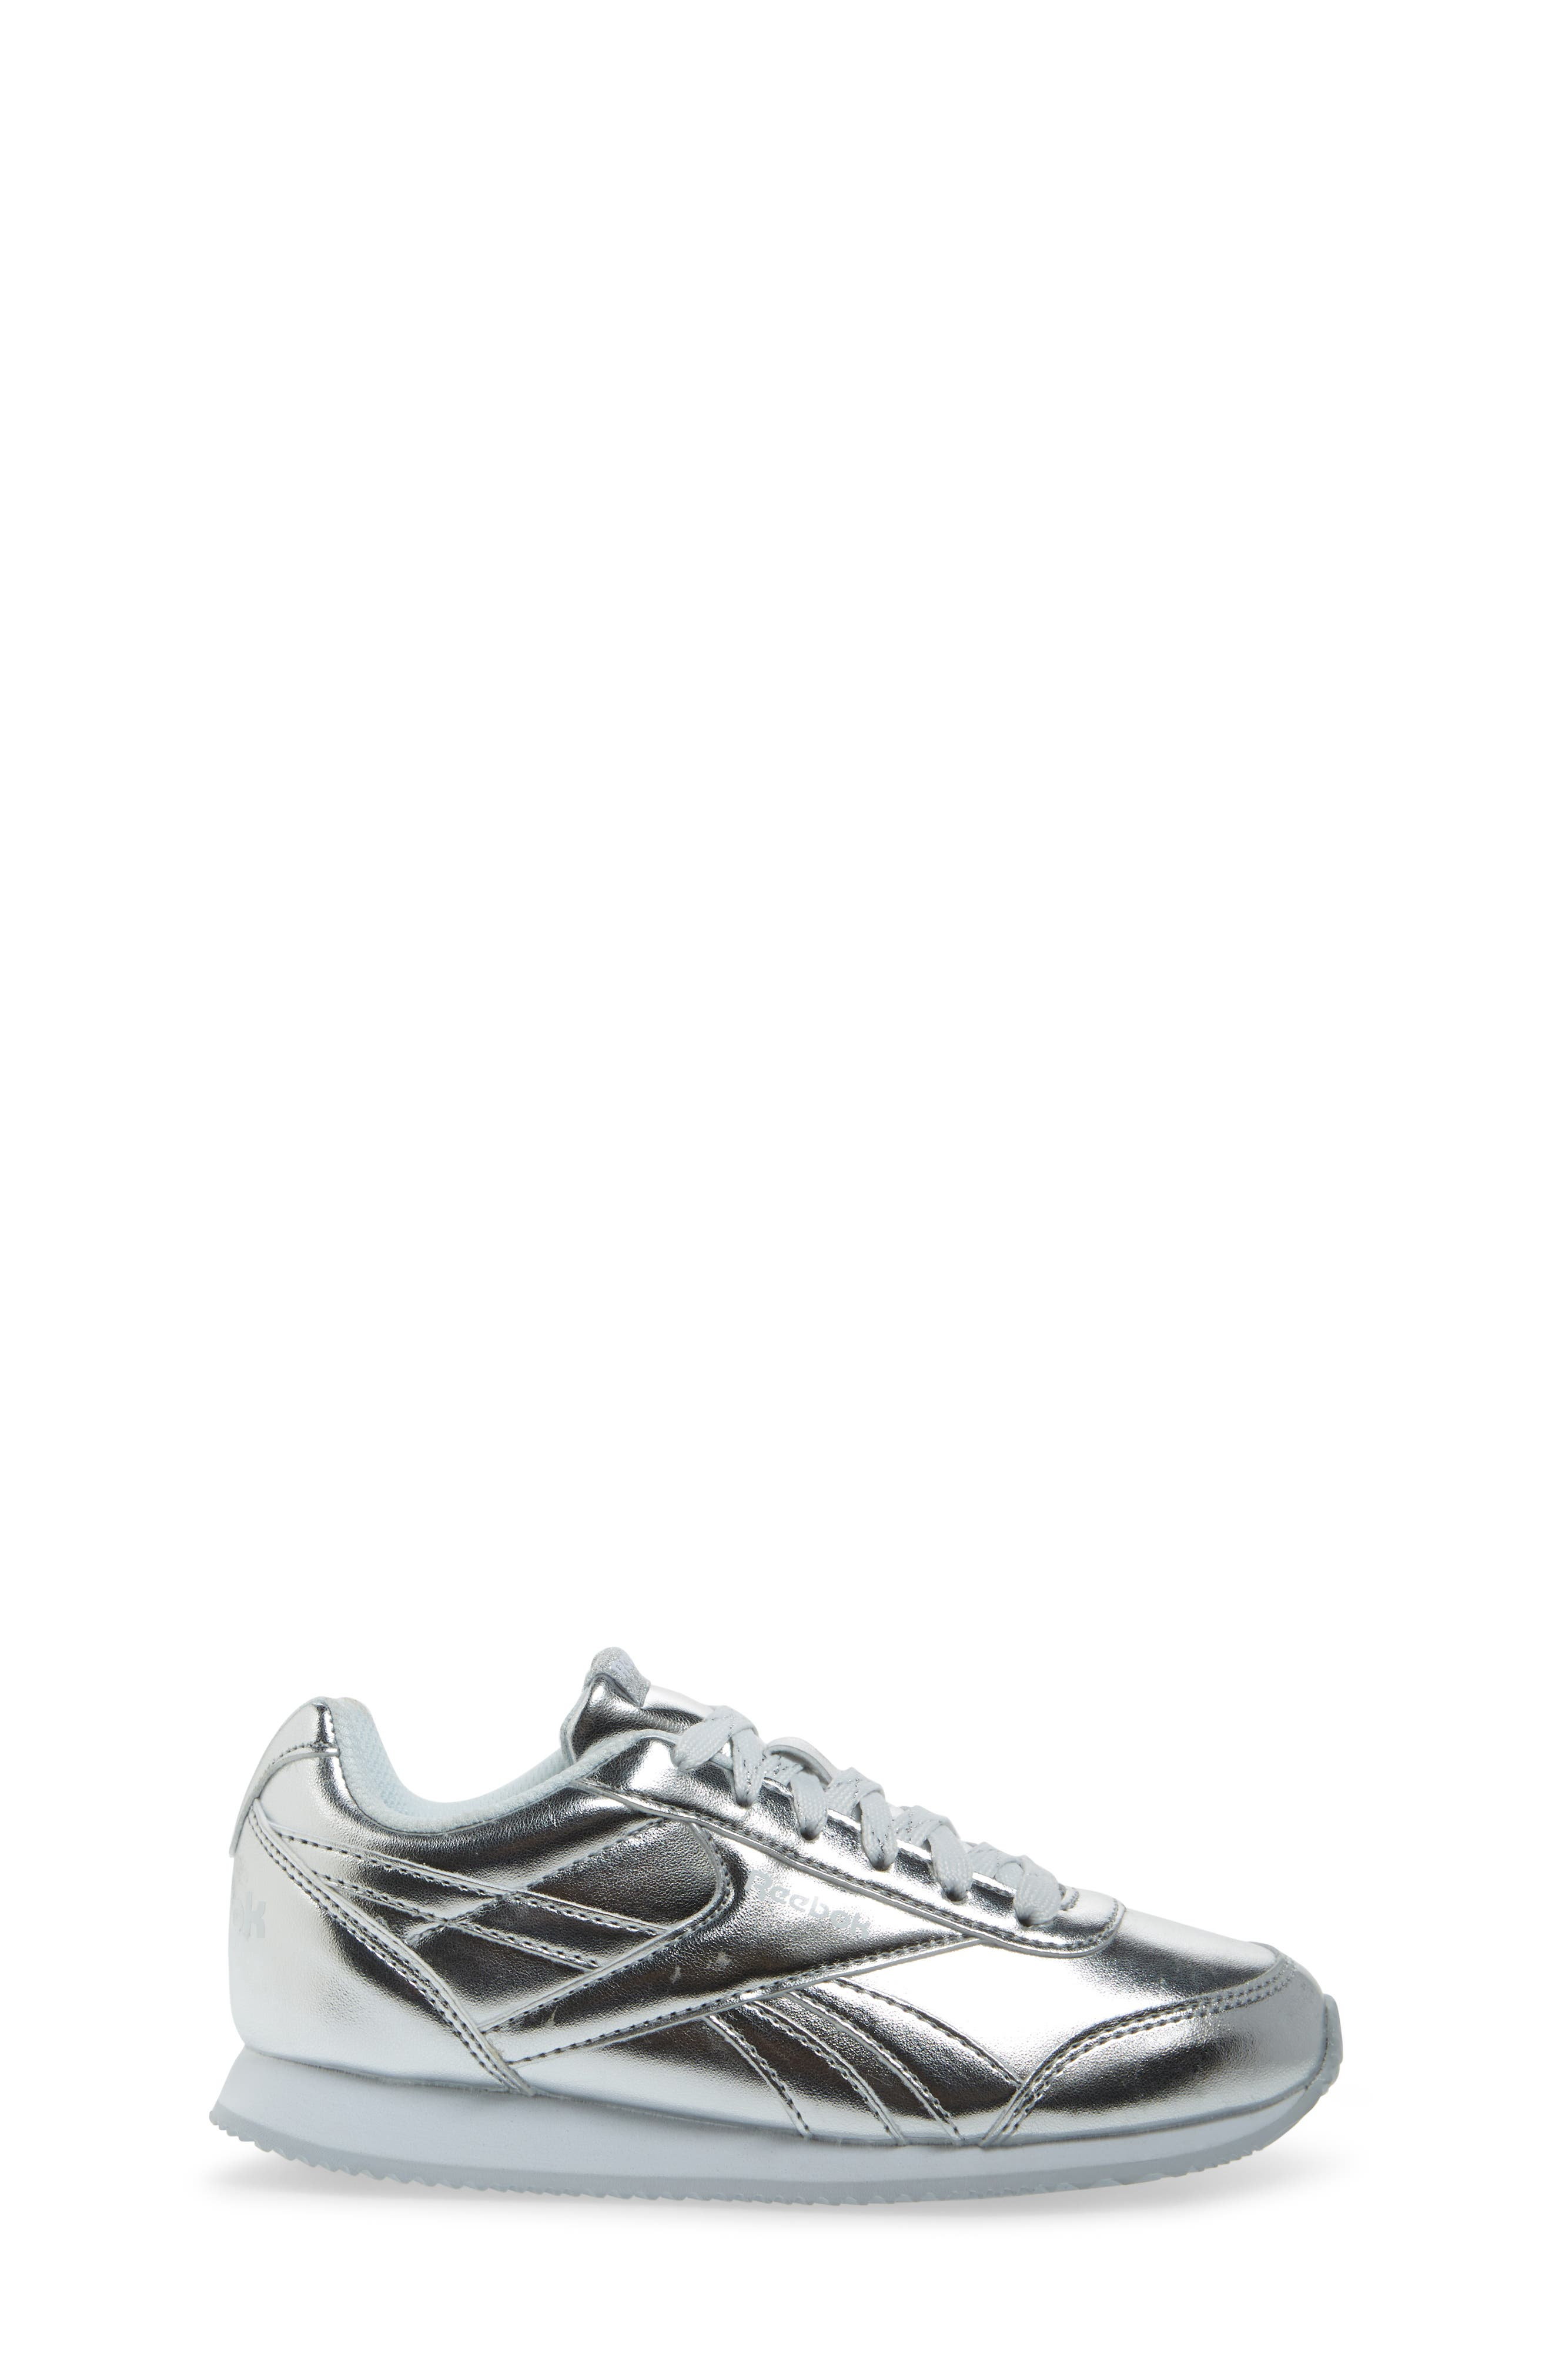 Royal Classic Jogger 2.0 Sneaker,                             Alternate thumbnail 3, color,                             Silver Metallic/ White